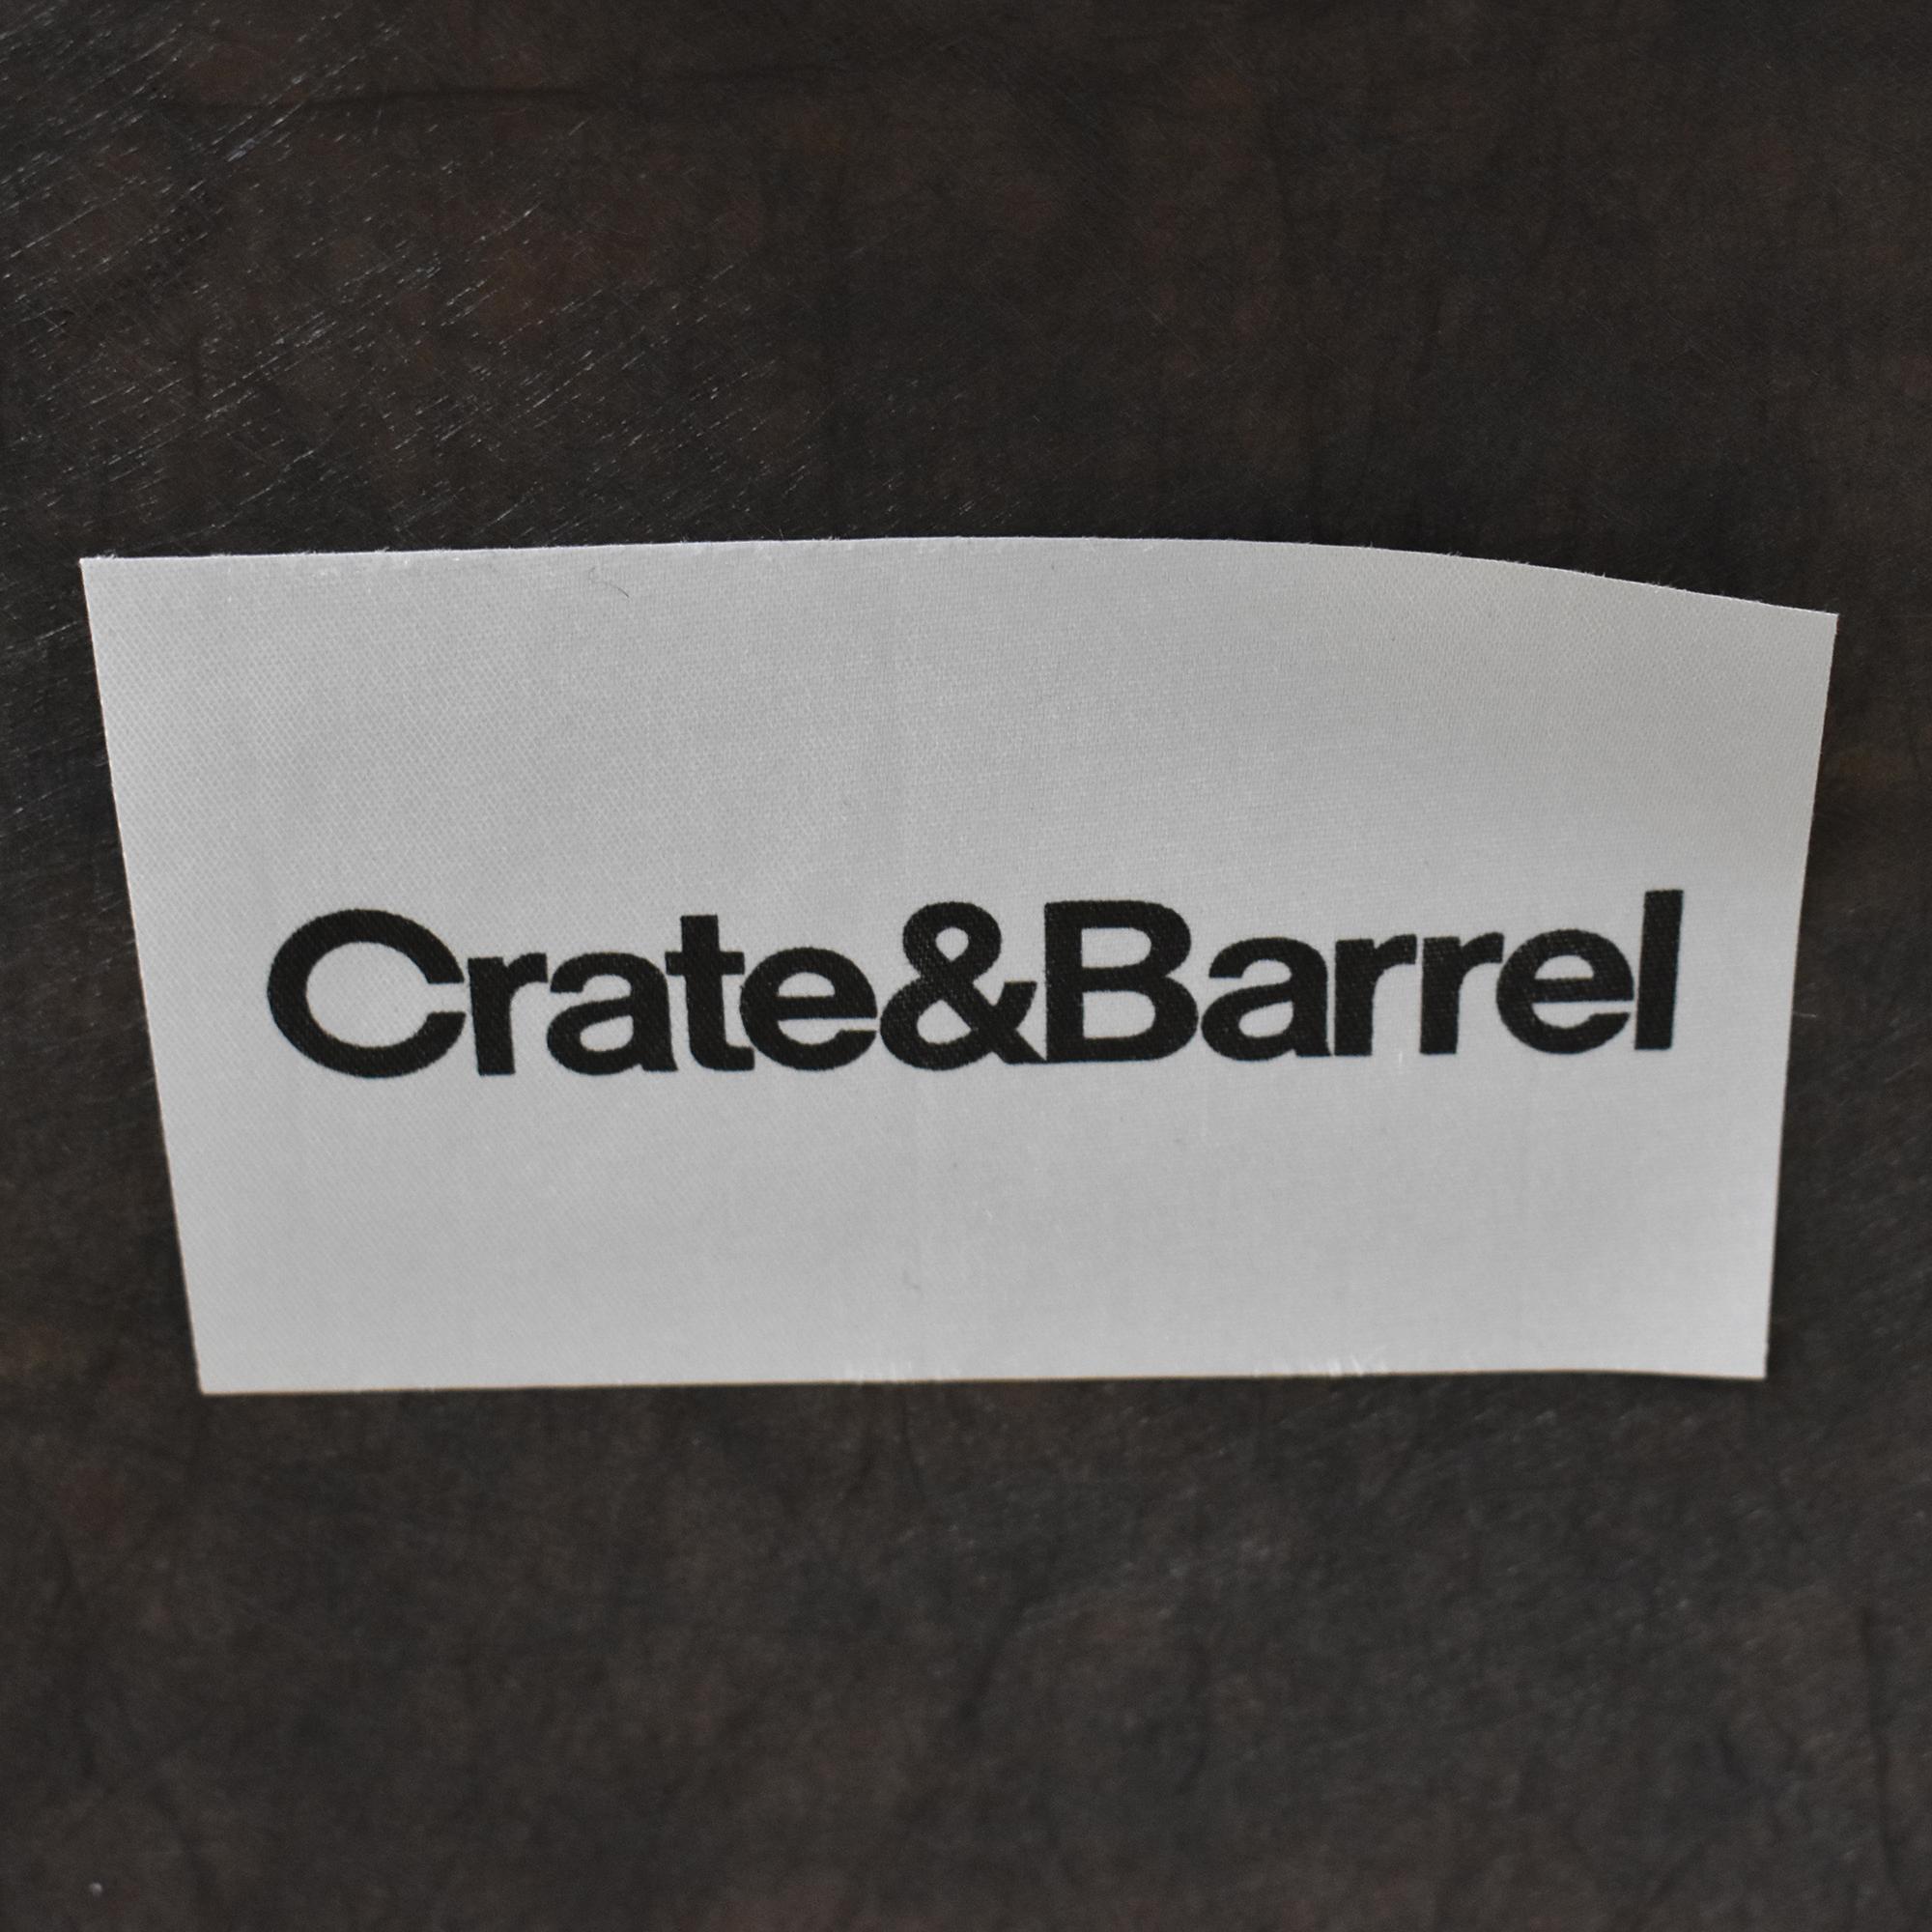 Crate & Barrel Crate & Barrel Margot Chair discount